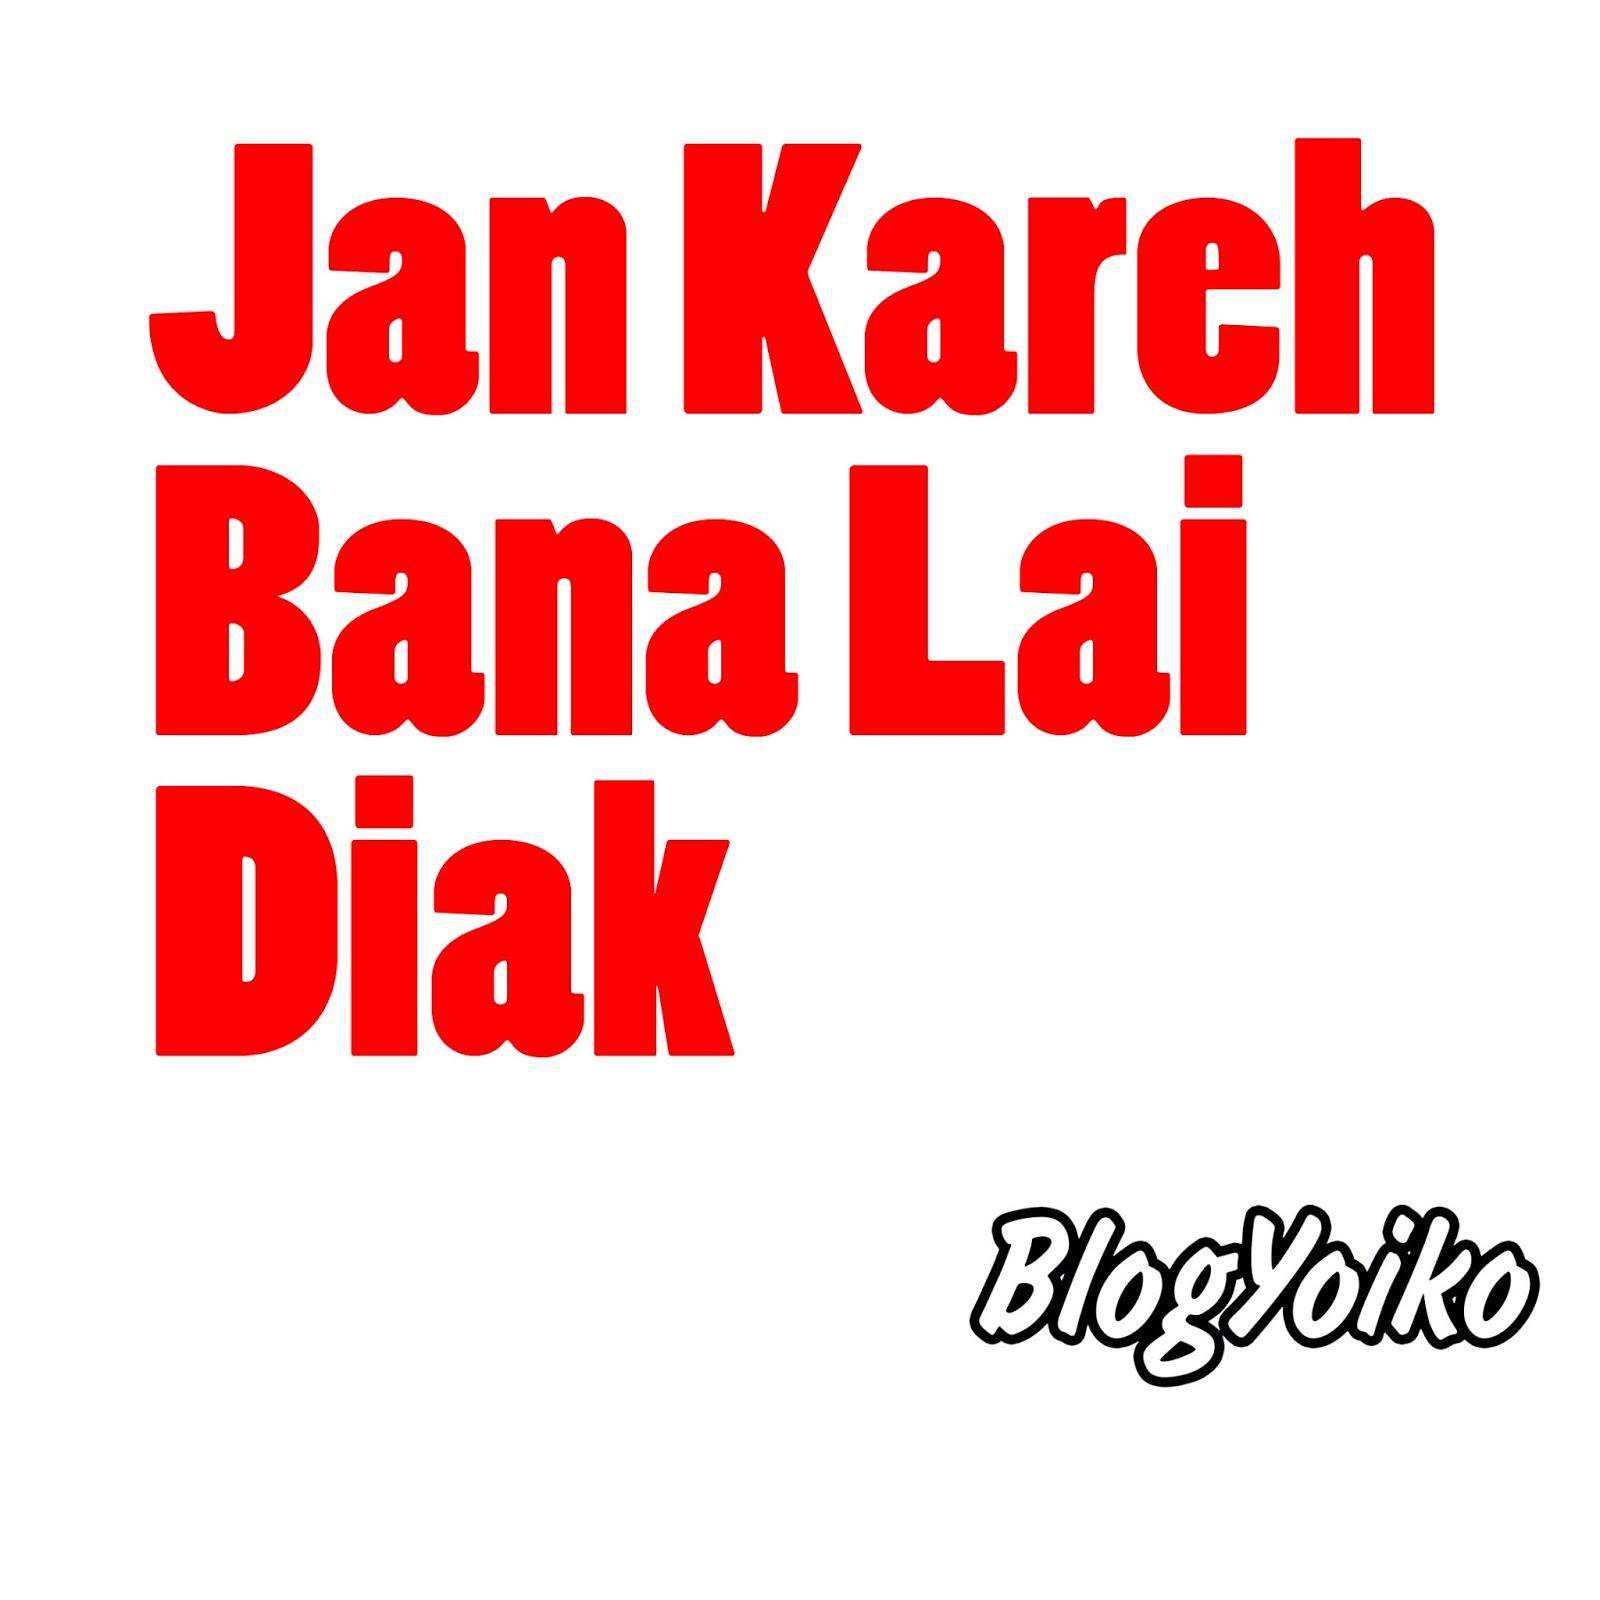 DP BBM Gambar Kata Lucu Bahasa Minang Terbaru  Blog Yoiko